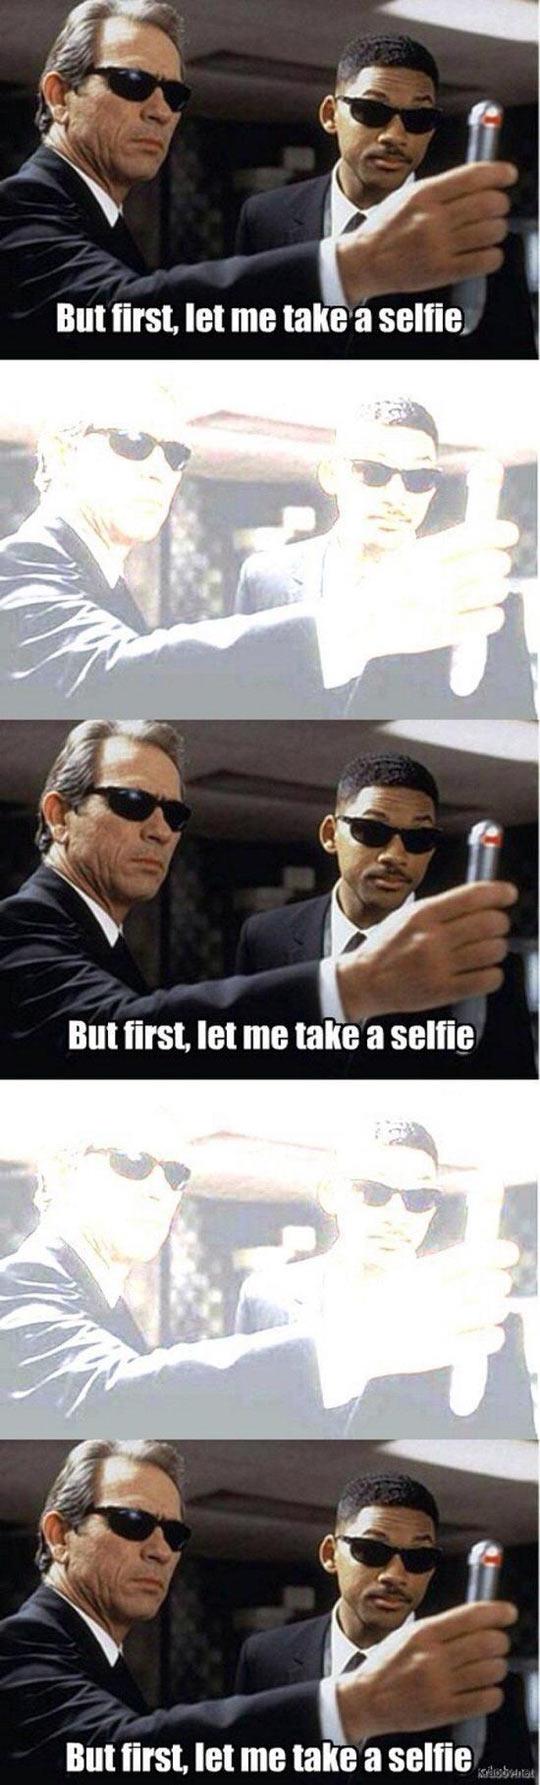 First Let Me Take A Selfie